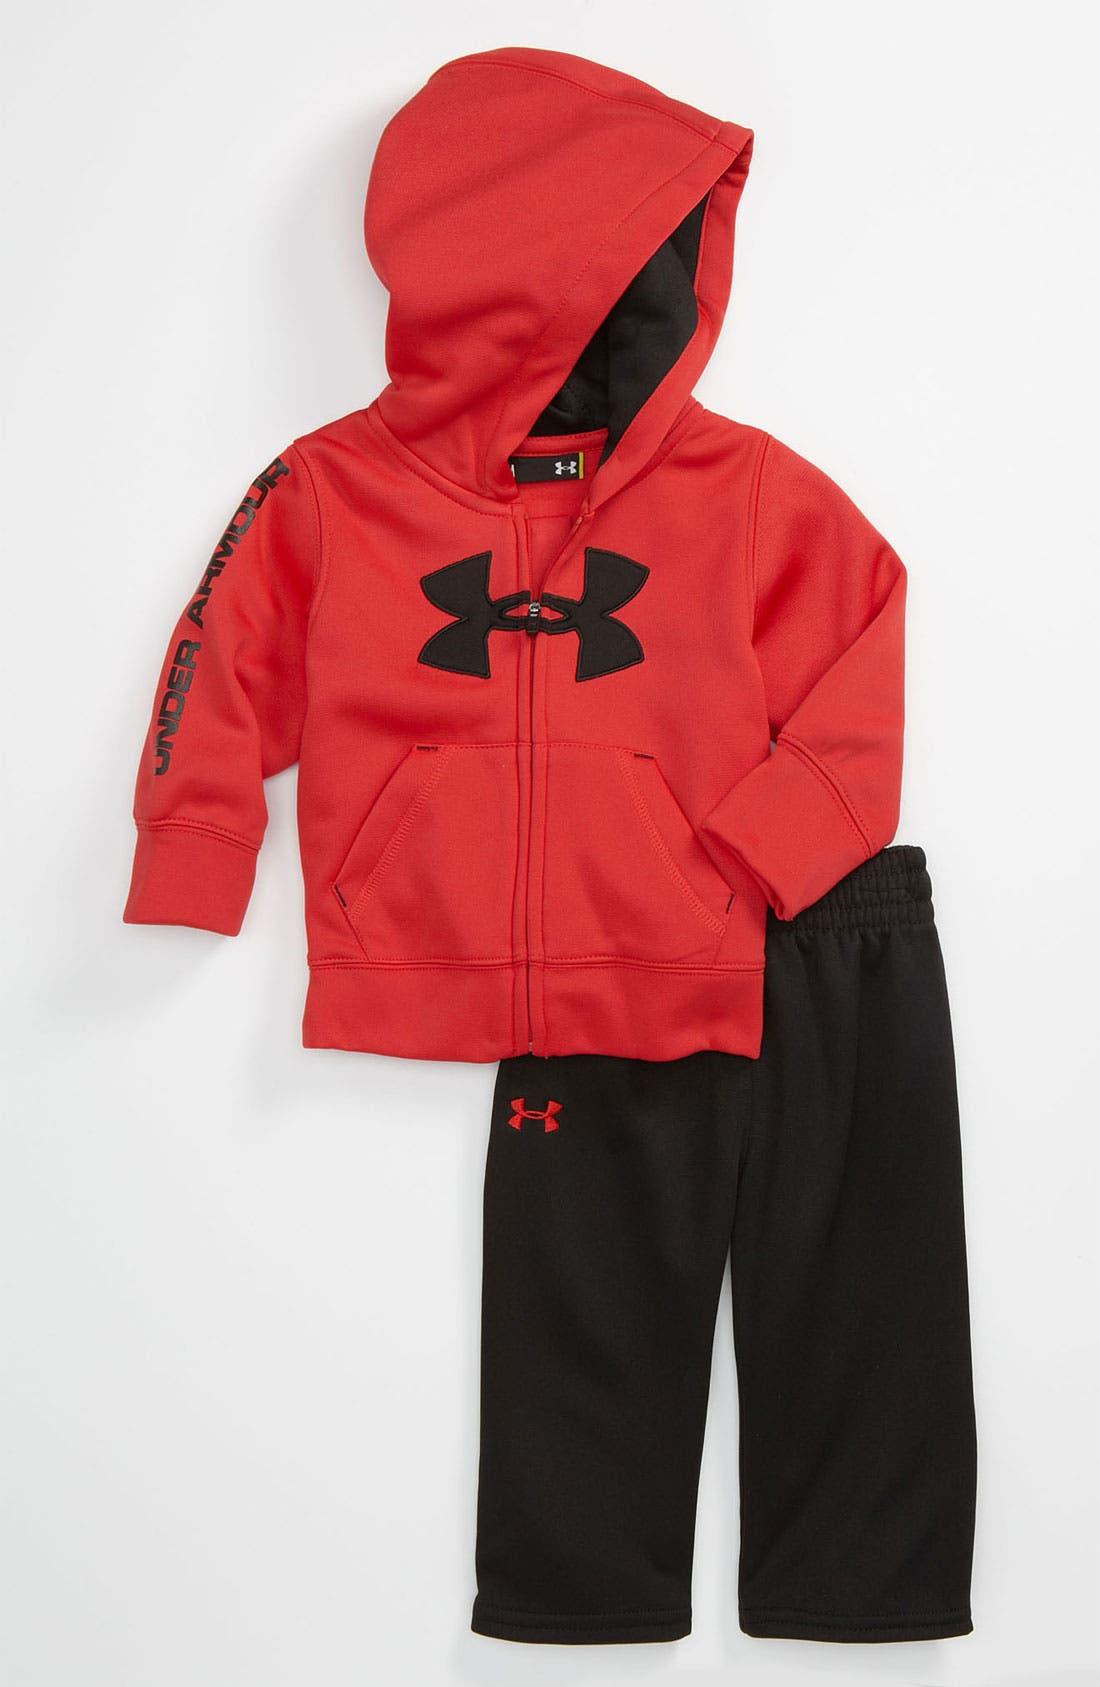 Main Image - Under Armour Zip Hoodie & Pants (Infant)